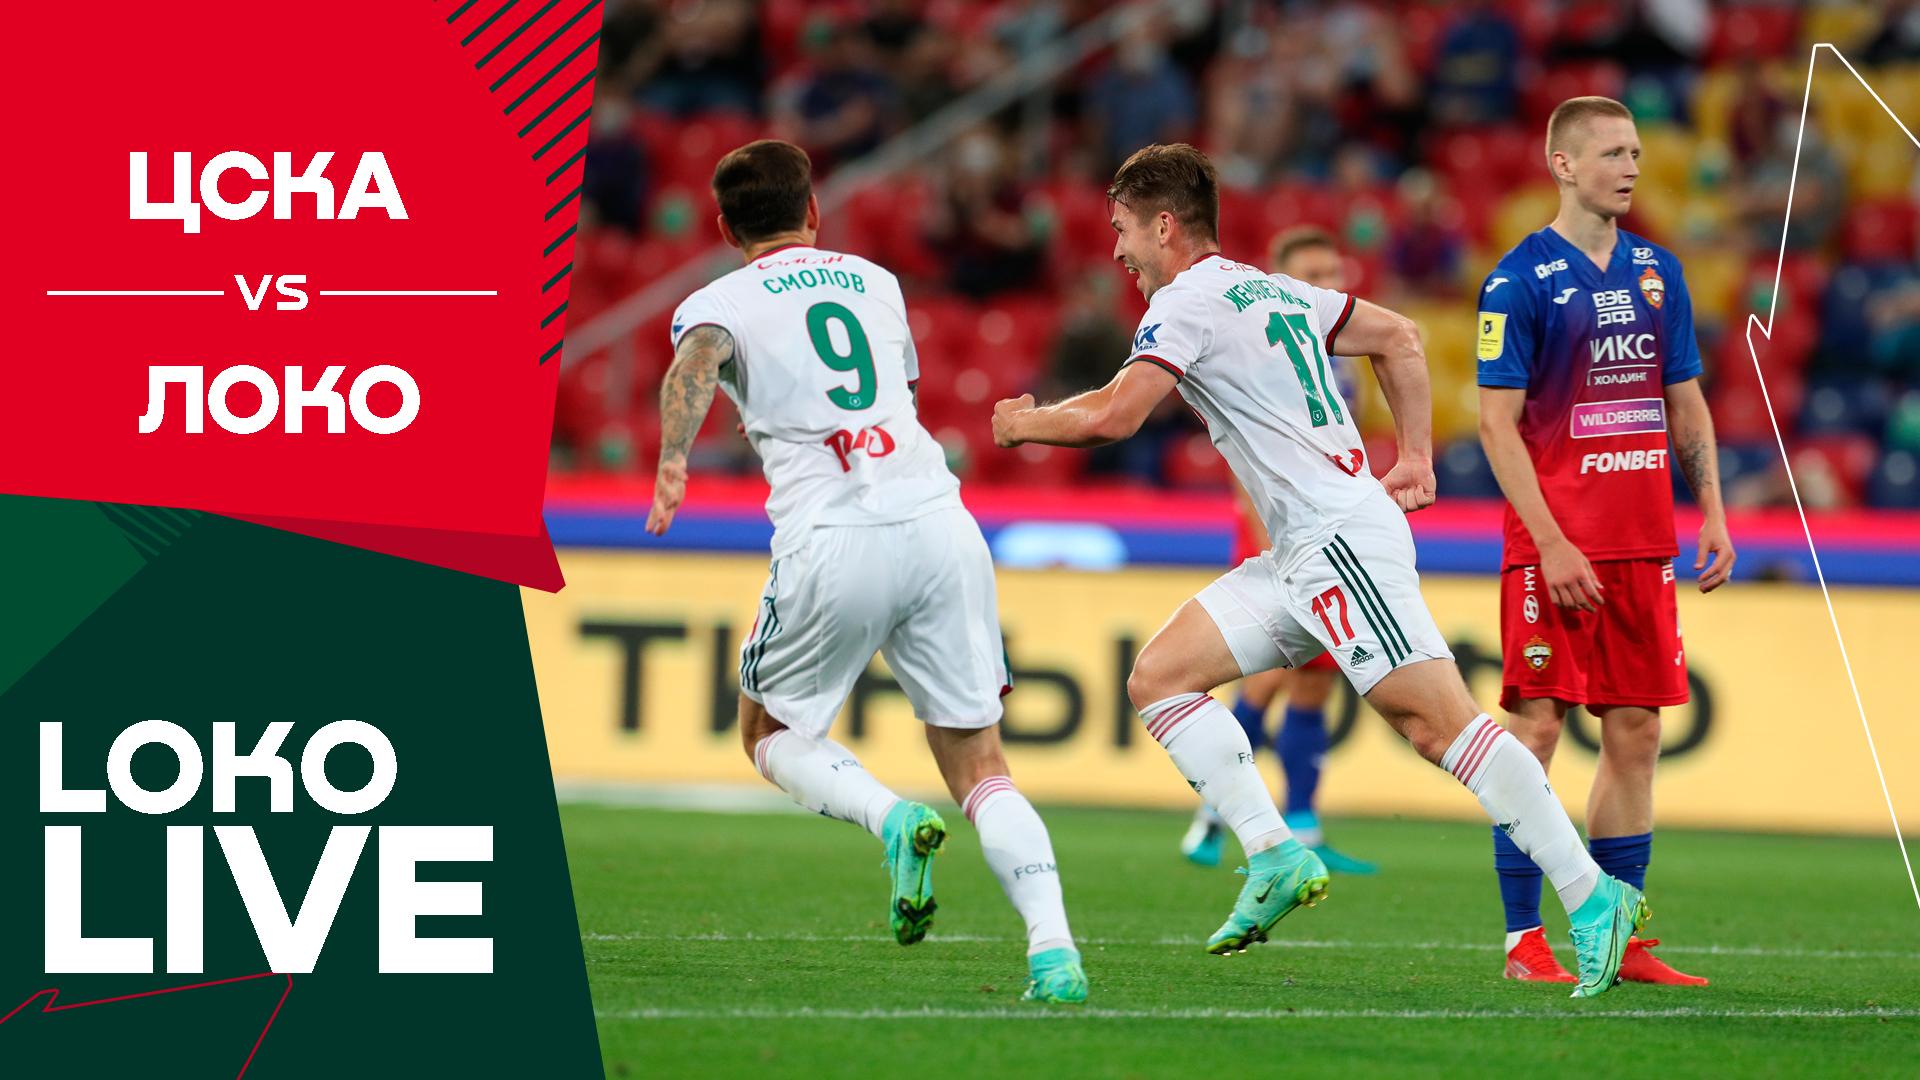 LOKO LIVE // CSKA – Lokomotiv // Winning the derby emotions